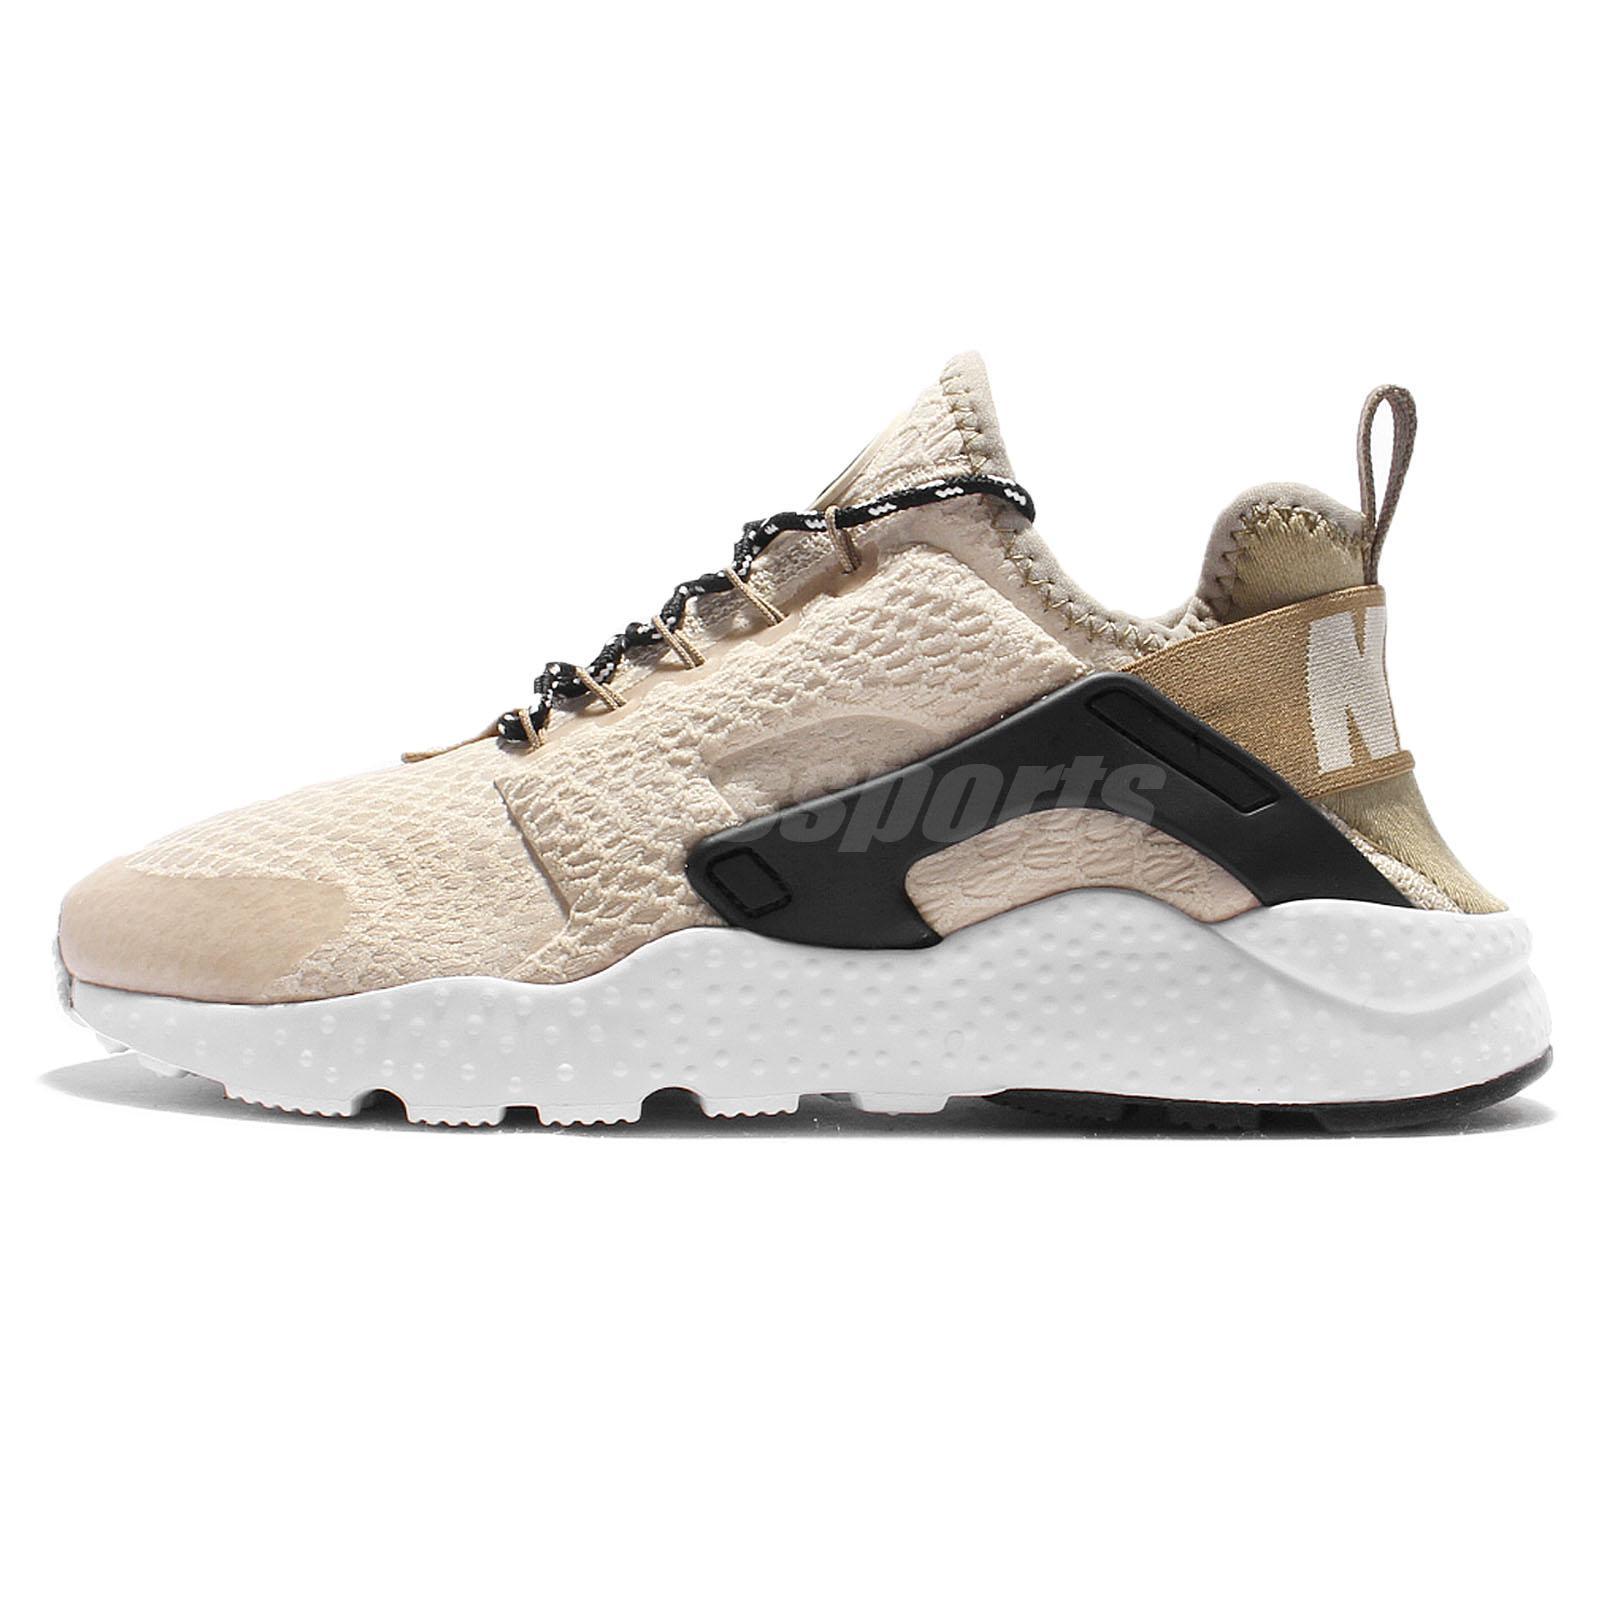 angustia Frente Comercialización  Nike Air Huarache Run Ultra SE Oatmeal Women Running Shoes 859516-100 | eBay